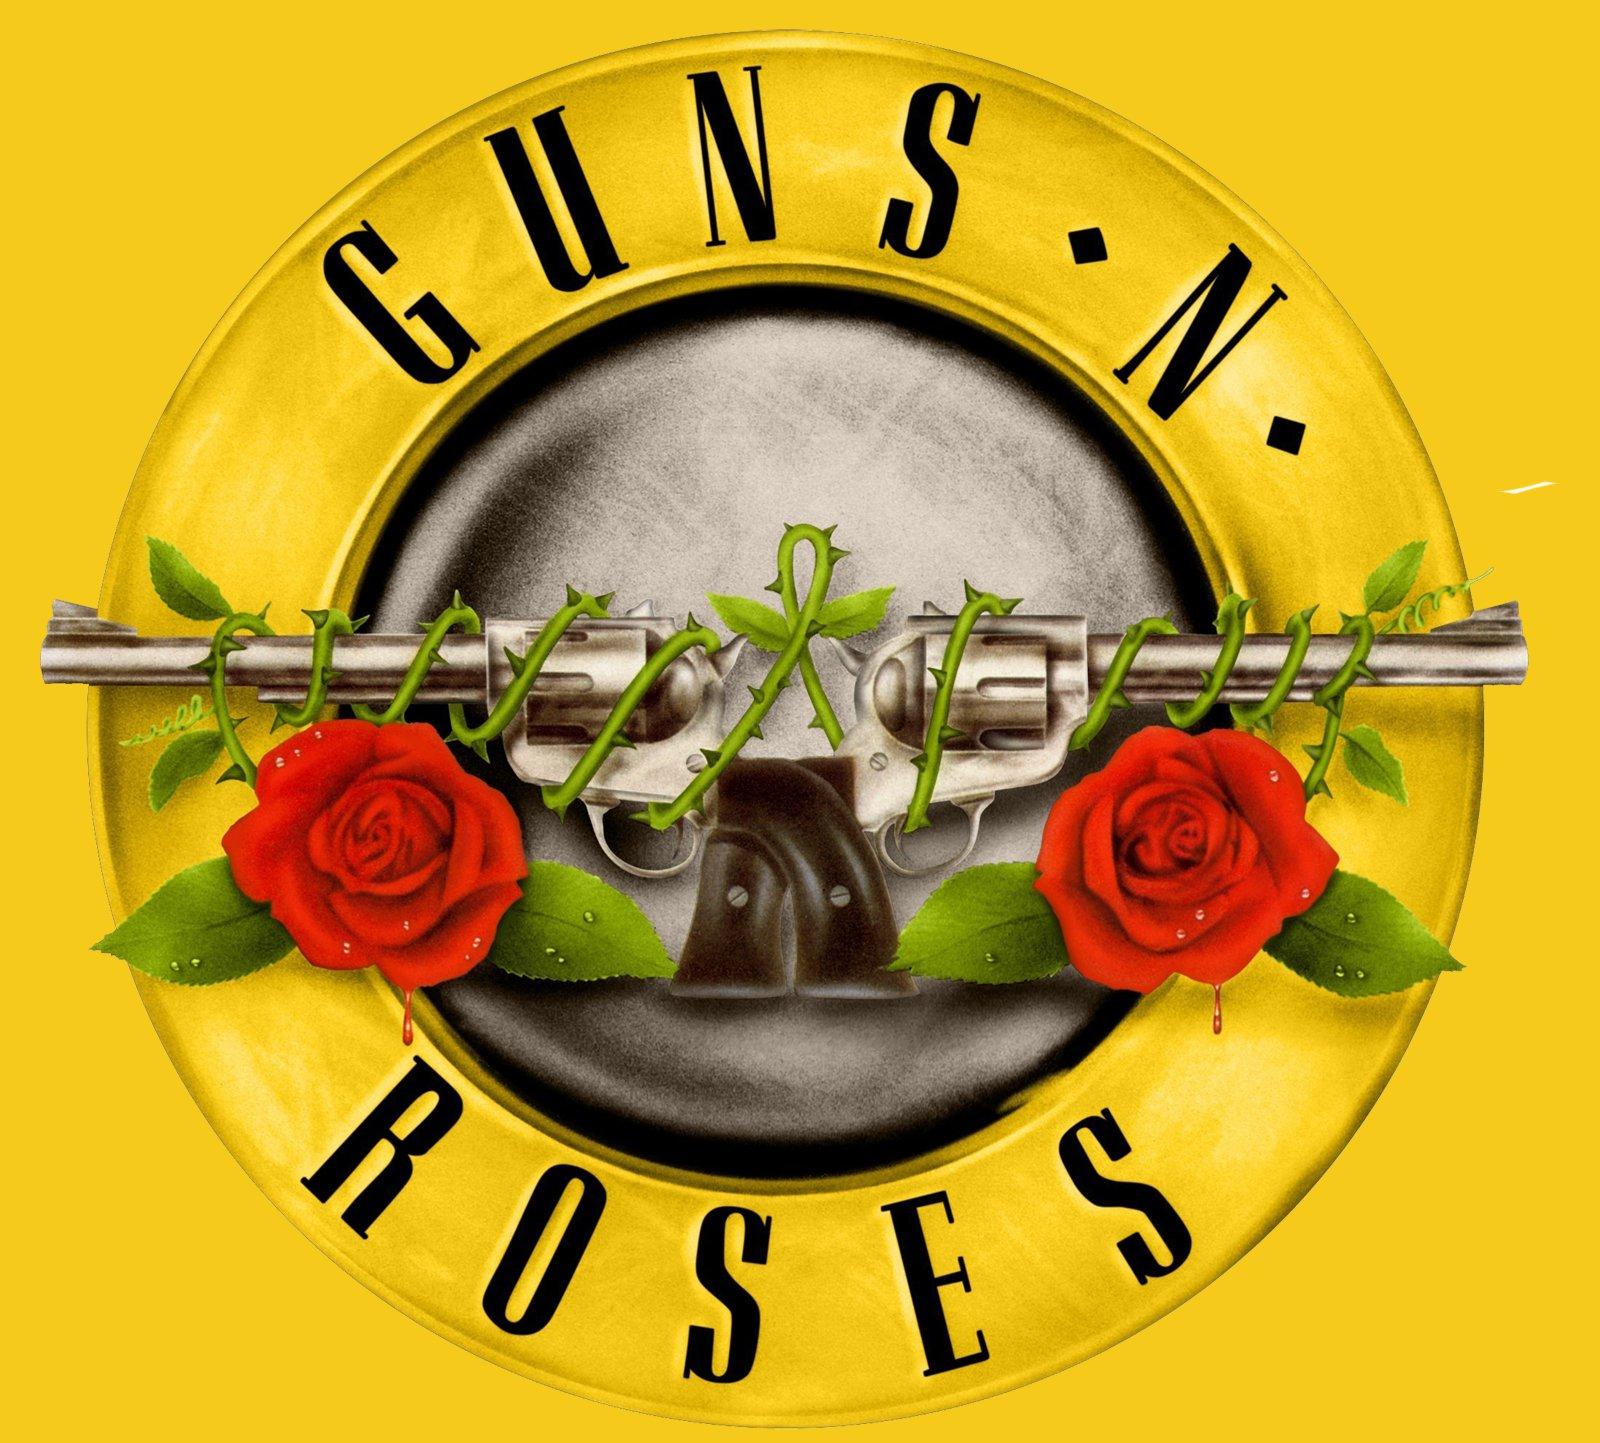 Meaning Guns N' Roses Logo And Symbol